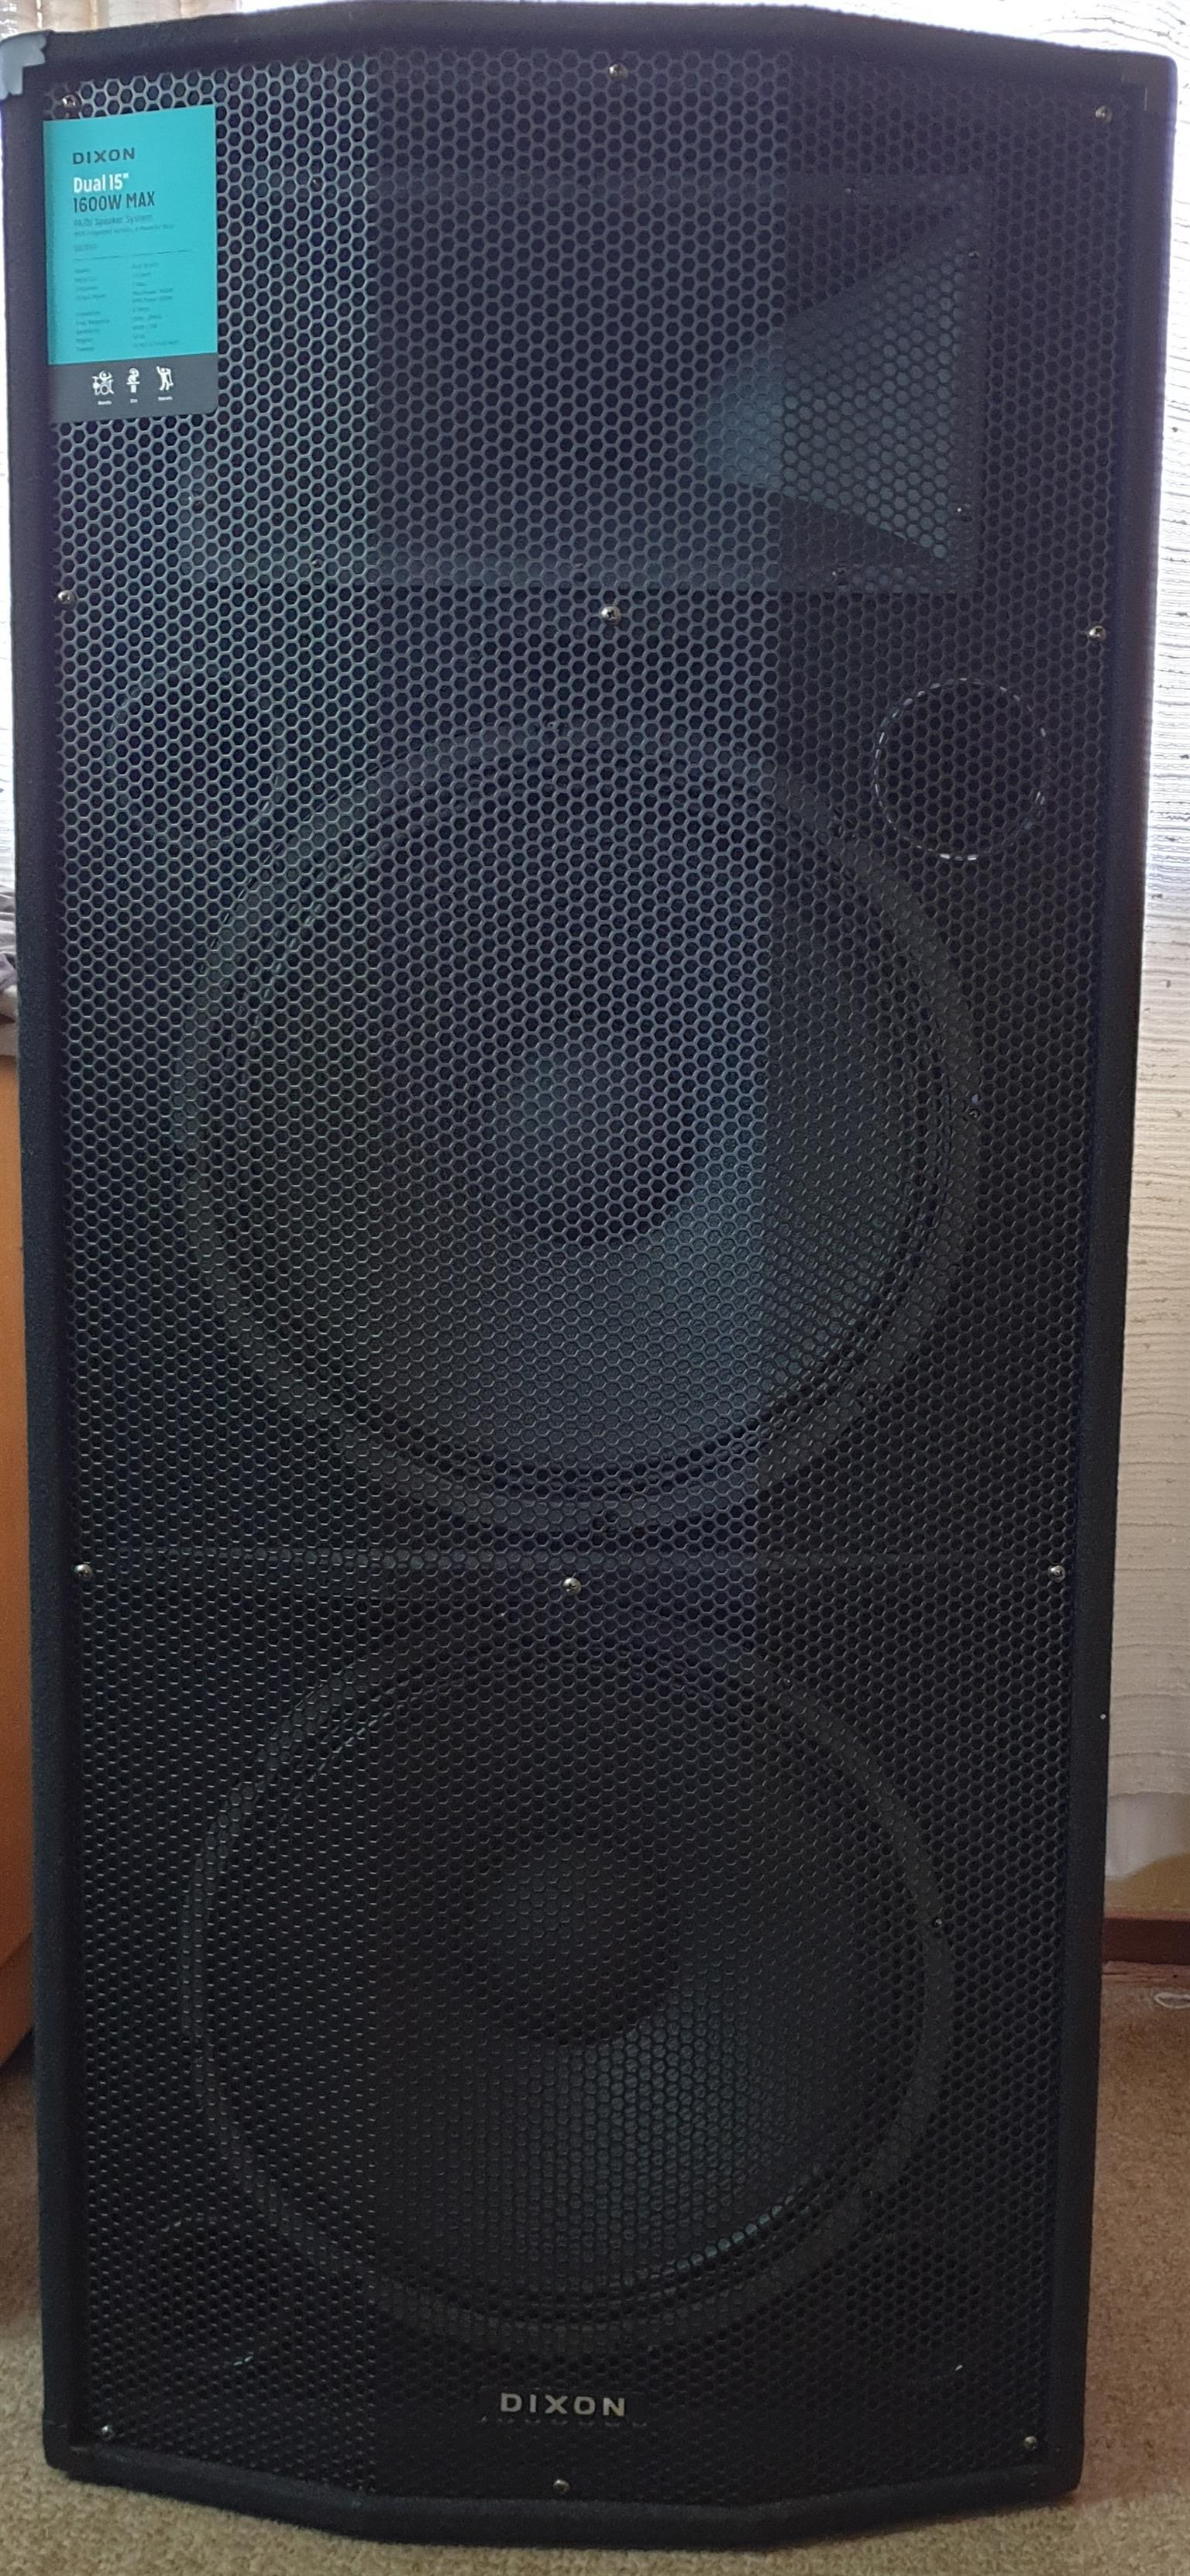 "Dixon 15"" DUAL speakers (x2) + Dixon 12-Channel Powered Amp-mixer"